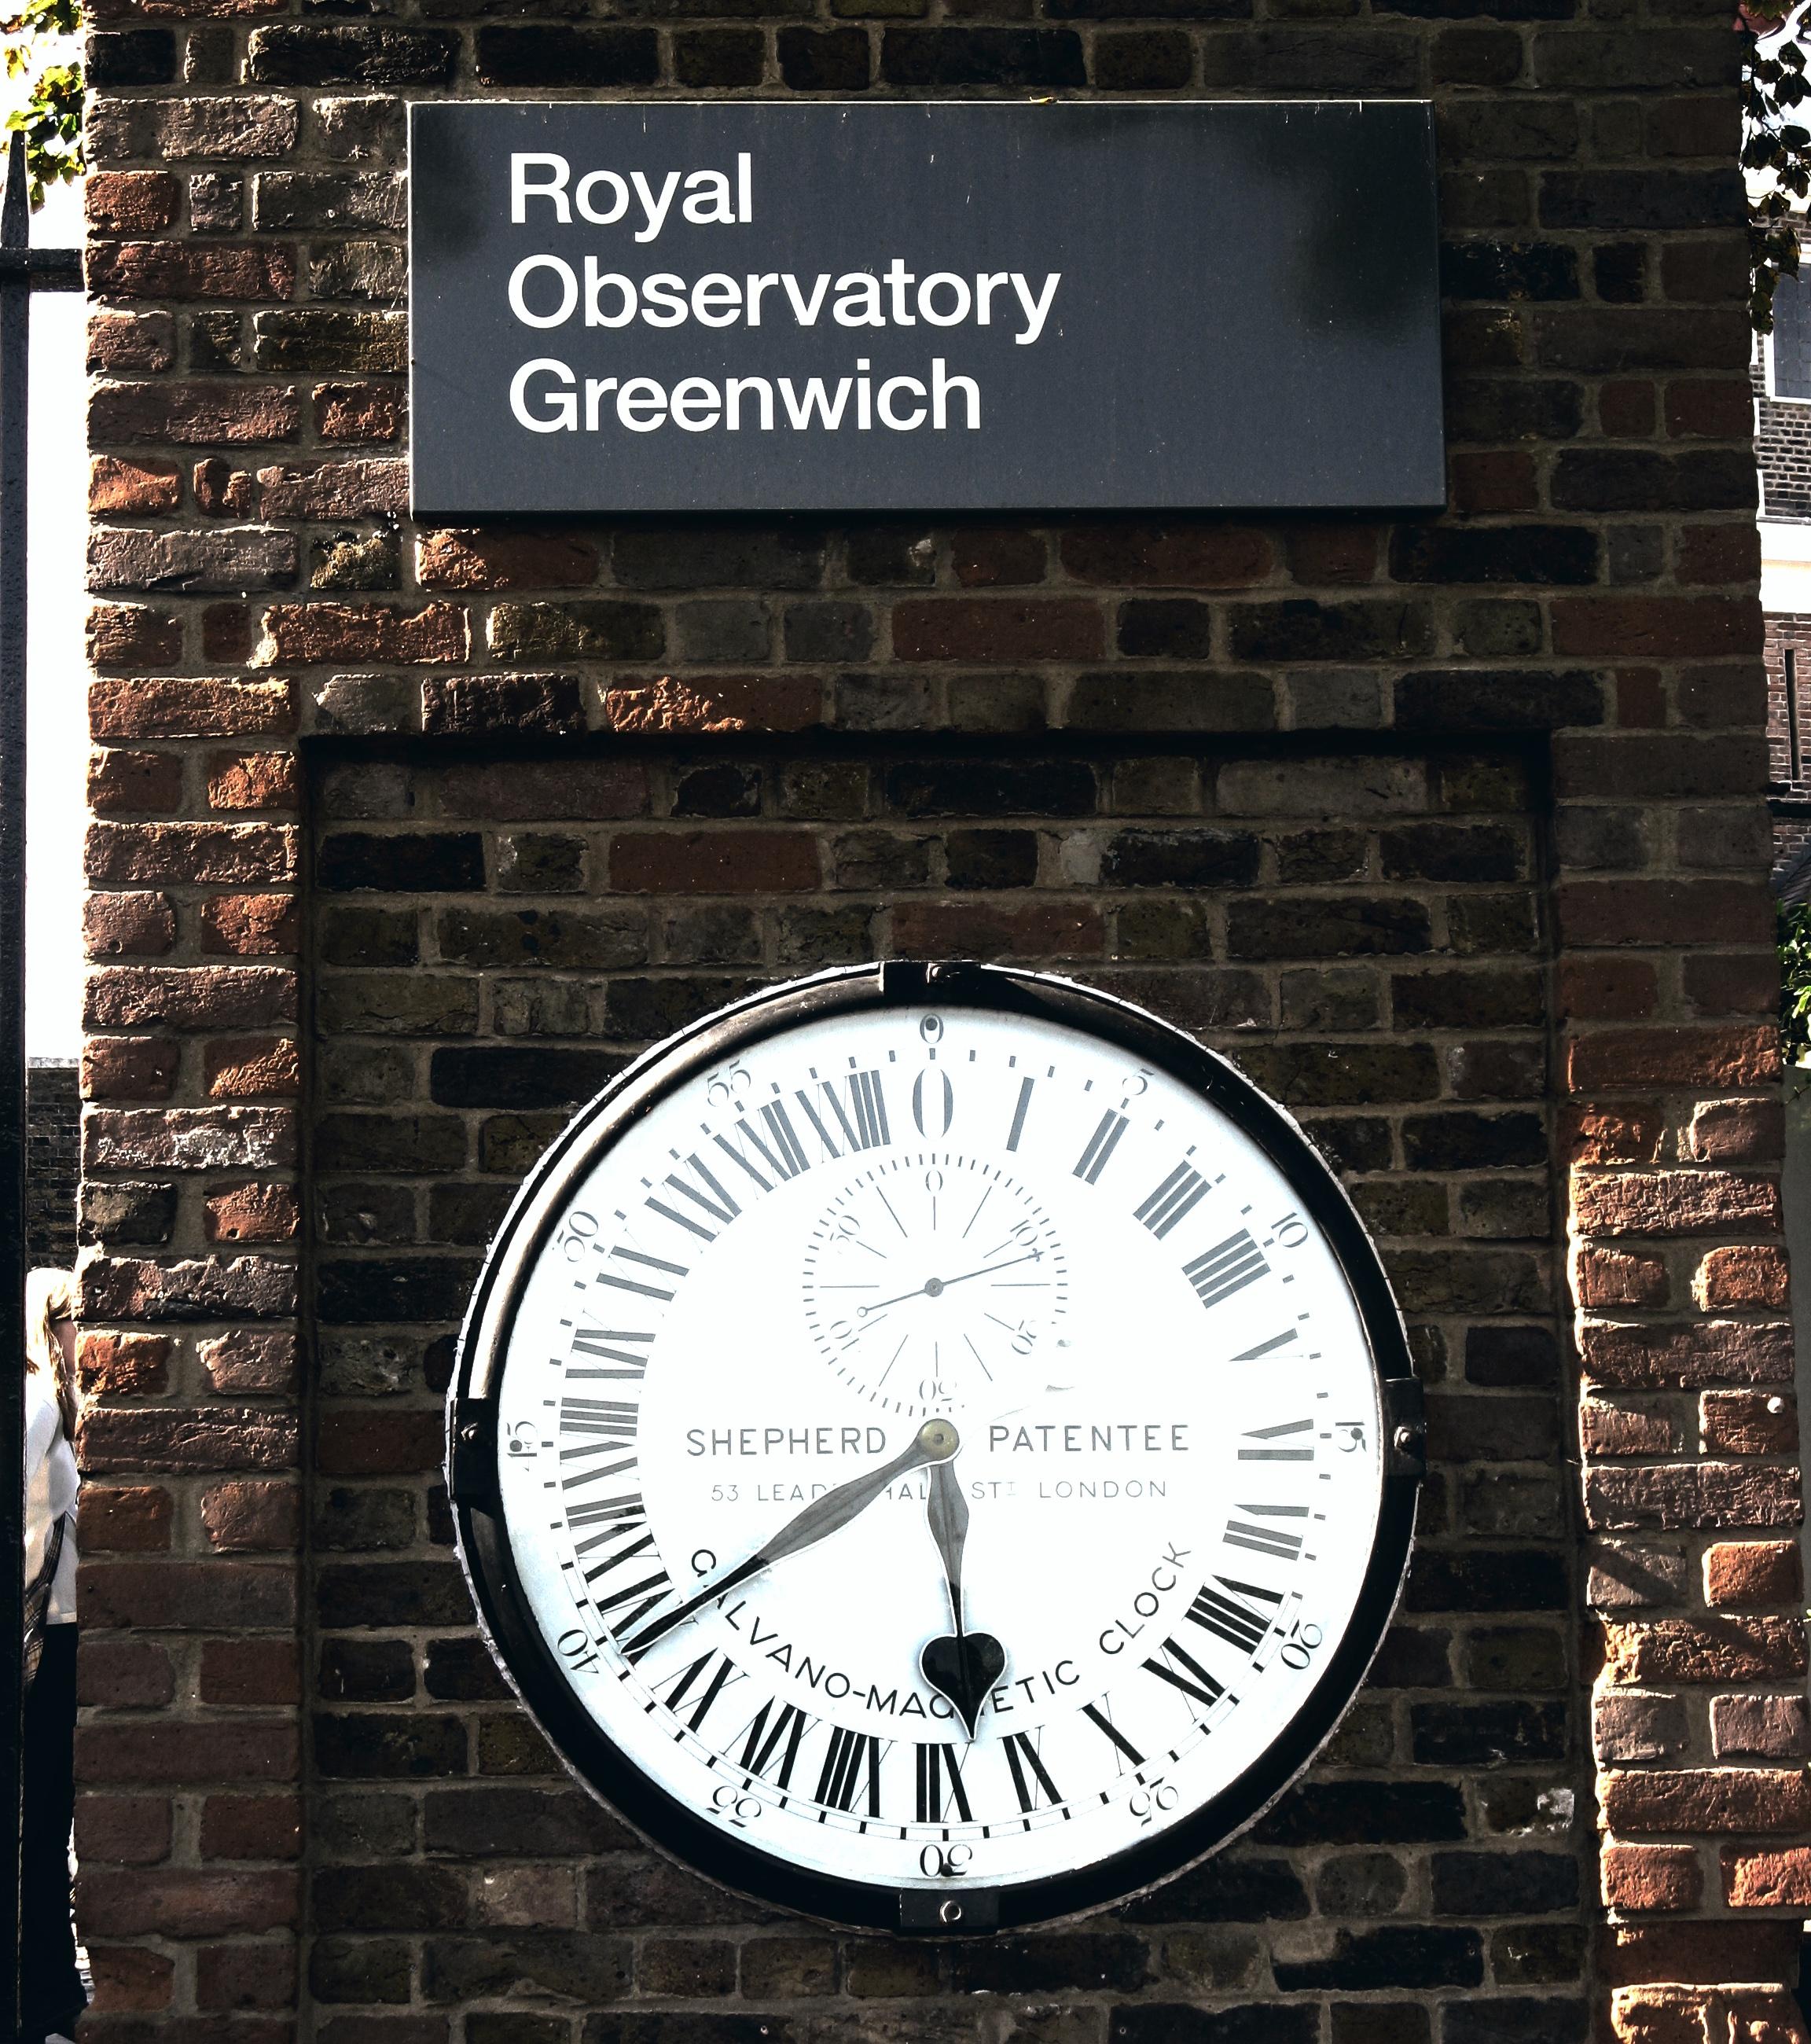 CLOCK AT GREENWICH, ENGLAND 2008